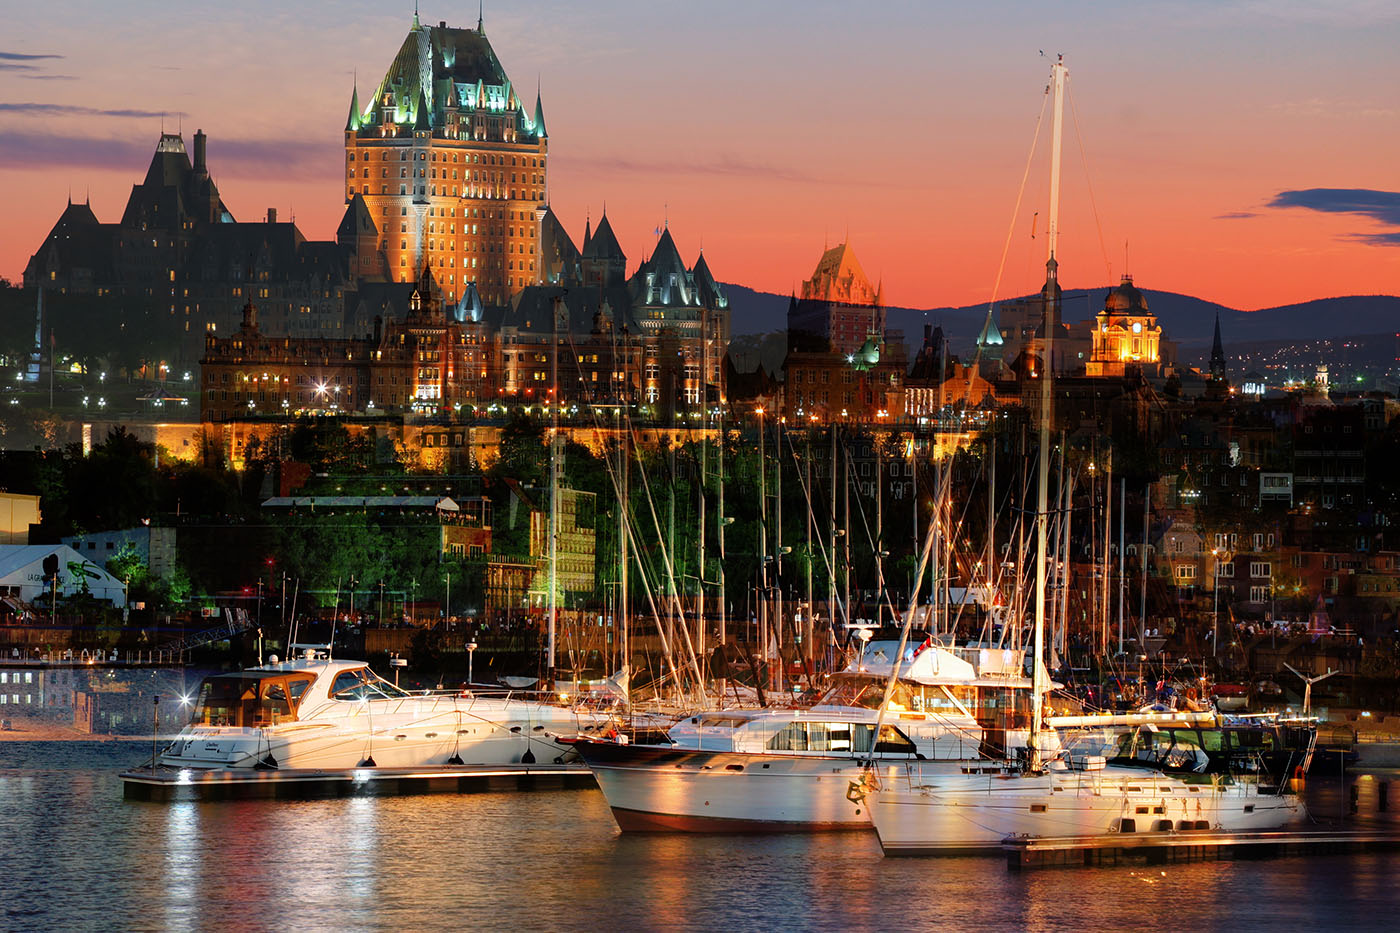 Quebec City Marina - Stock Photo